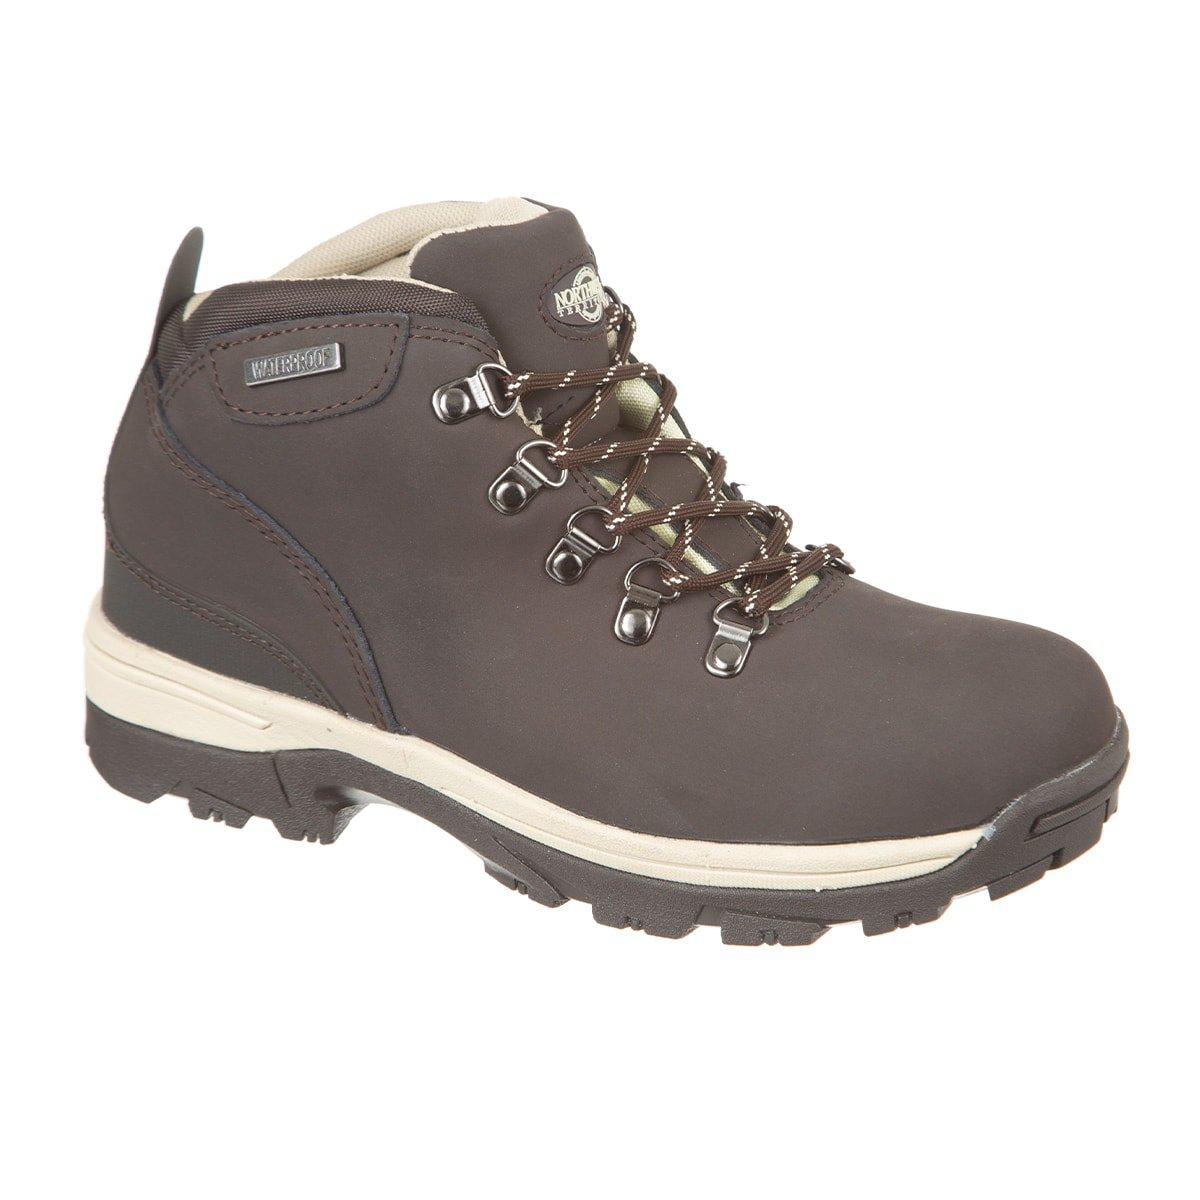 Northwest Territory Women's Waterproof Leather Walking and Hiking Boot I Trek Brown (UK SIZES 3-8)